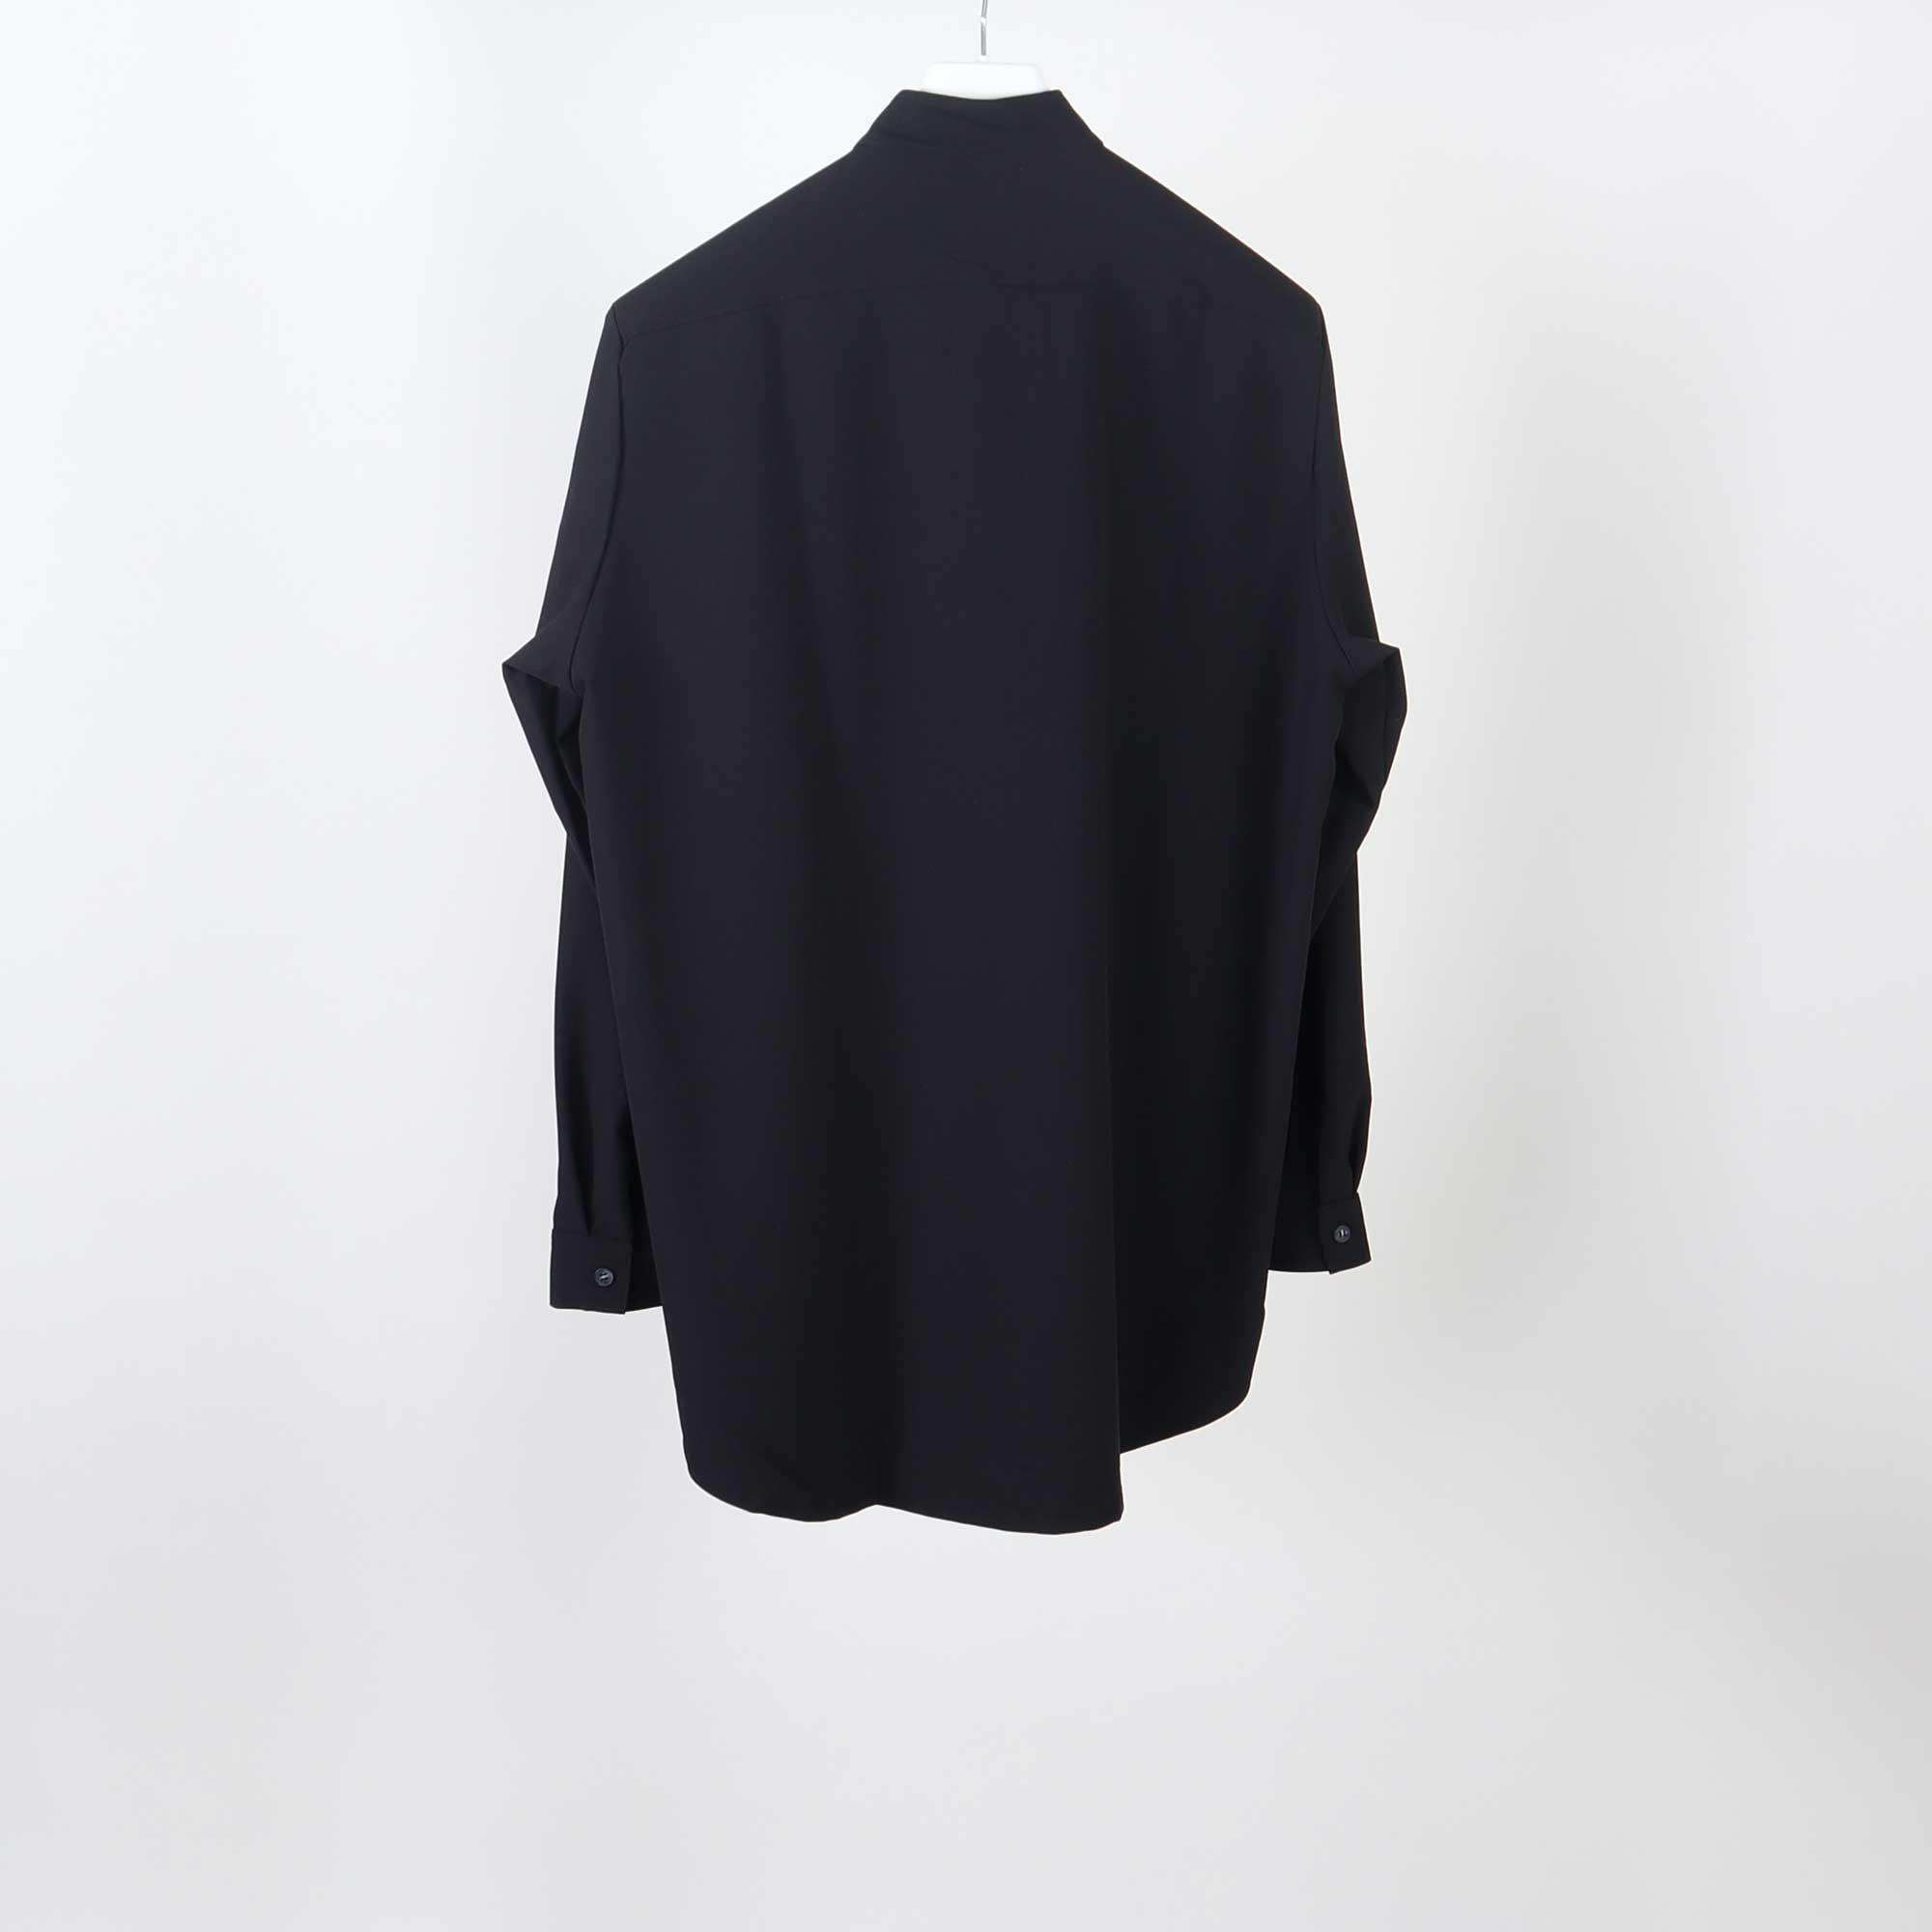 zippy-zwart-11